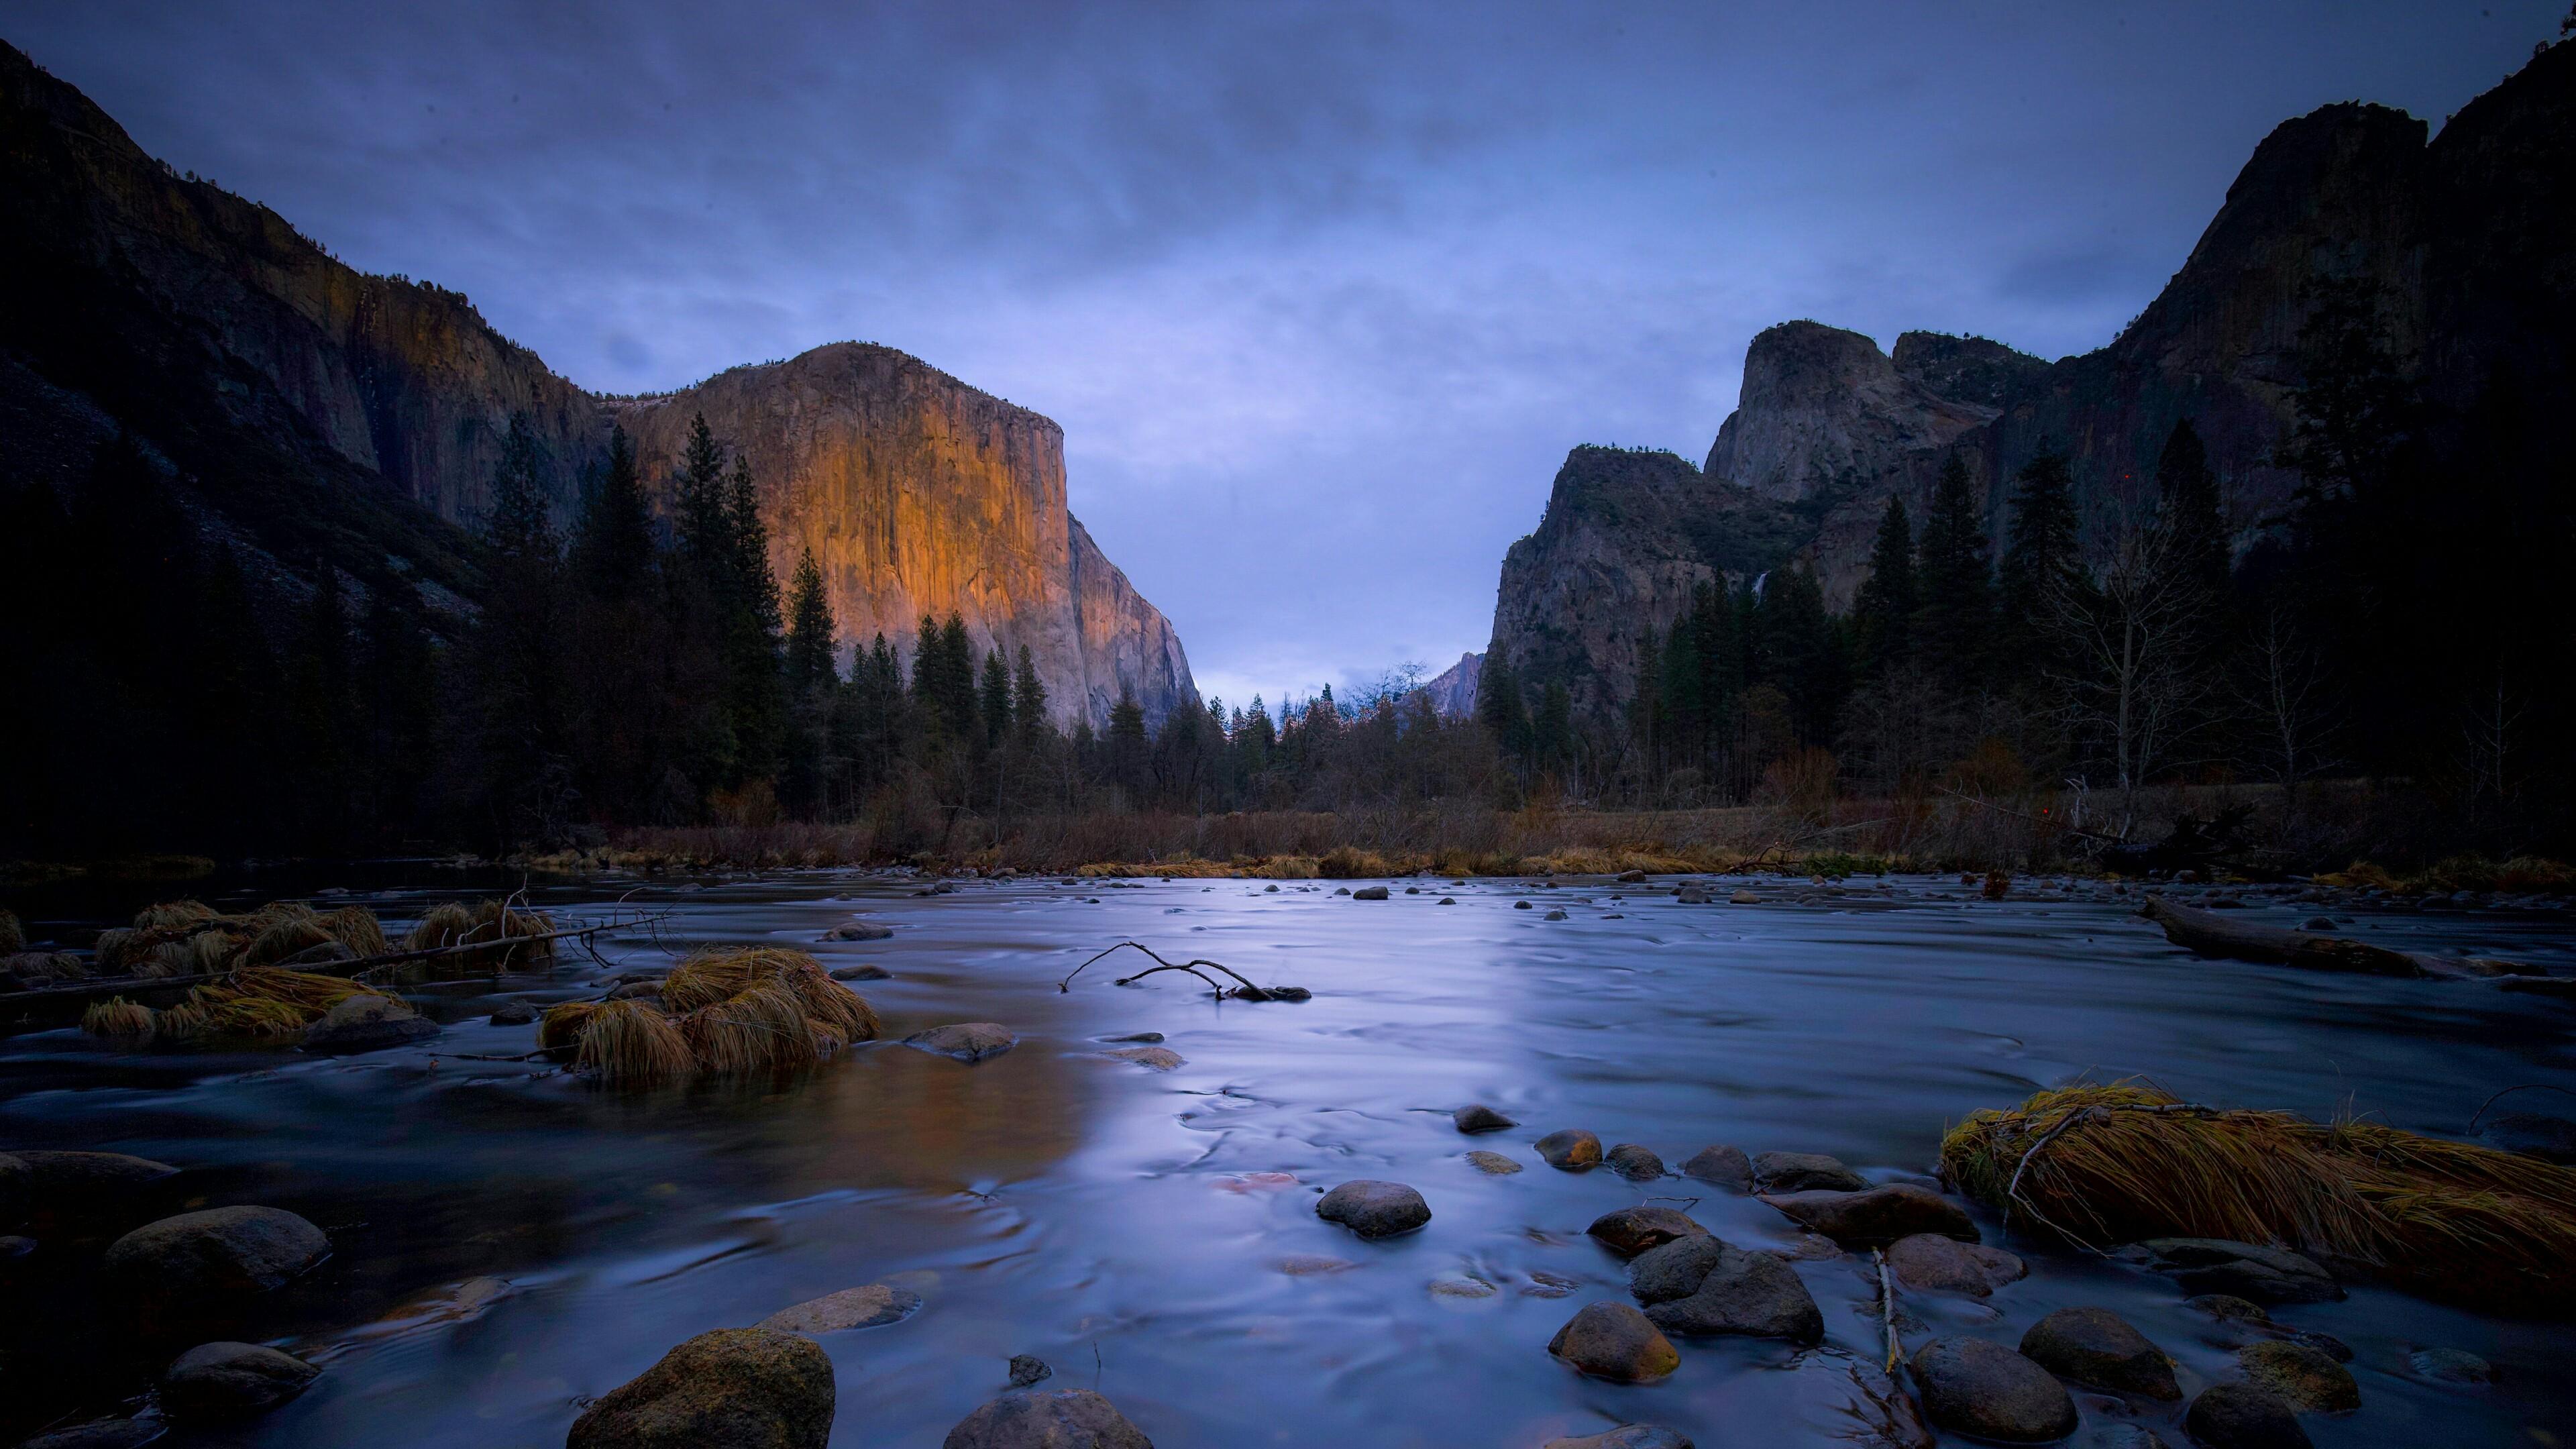 Yosemite Valley Tunnel View wallpaper